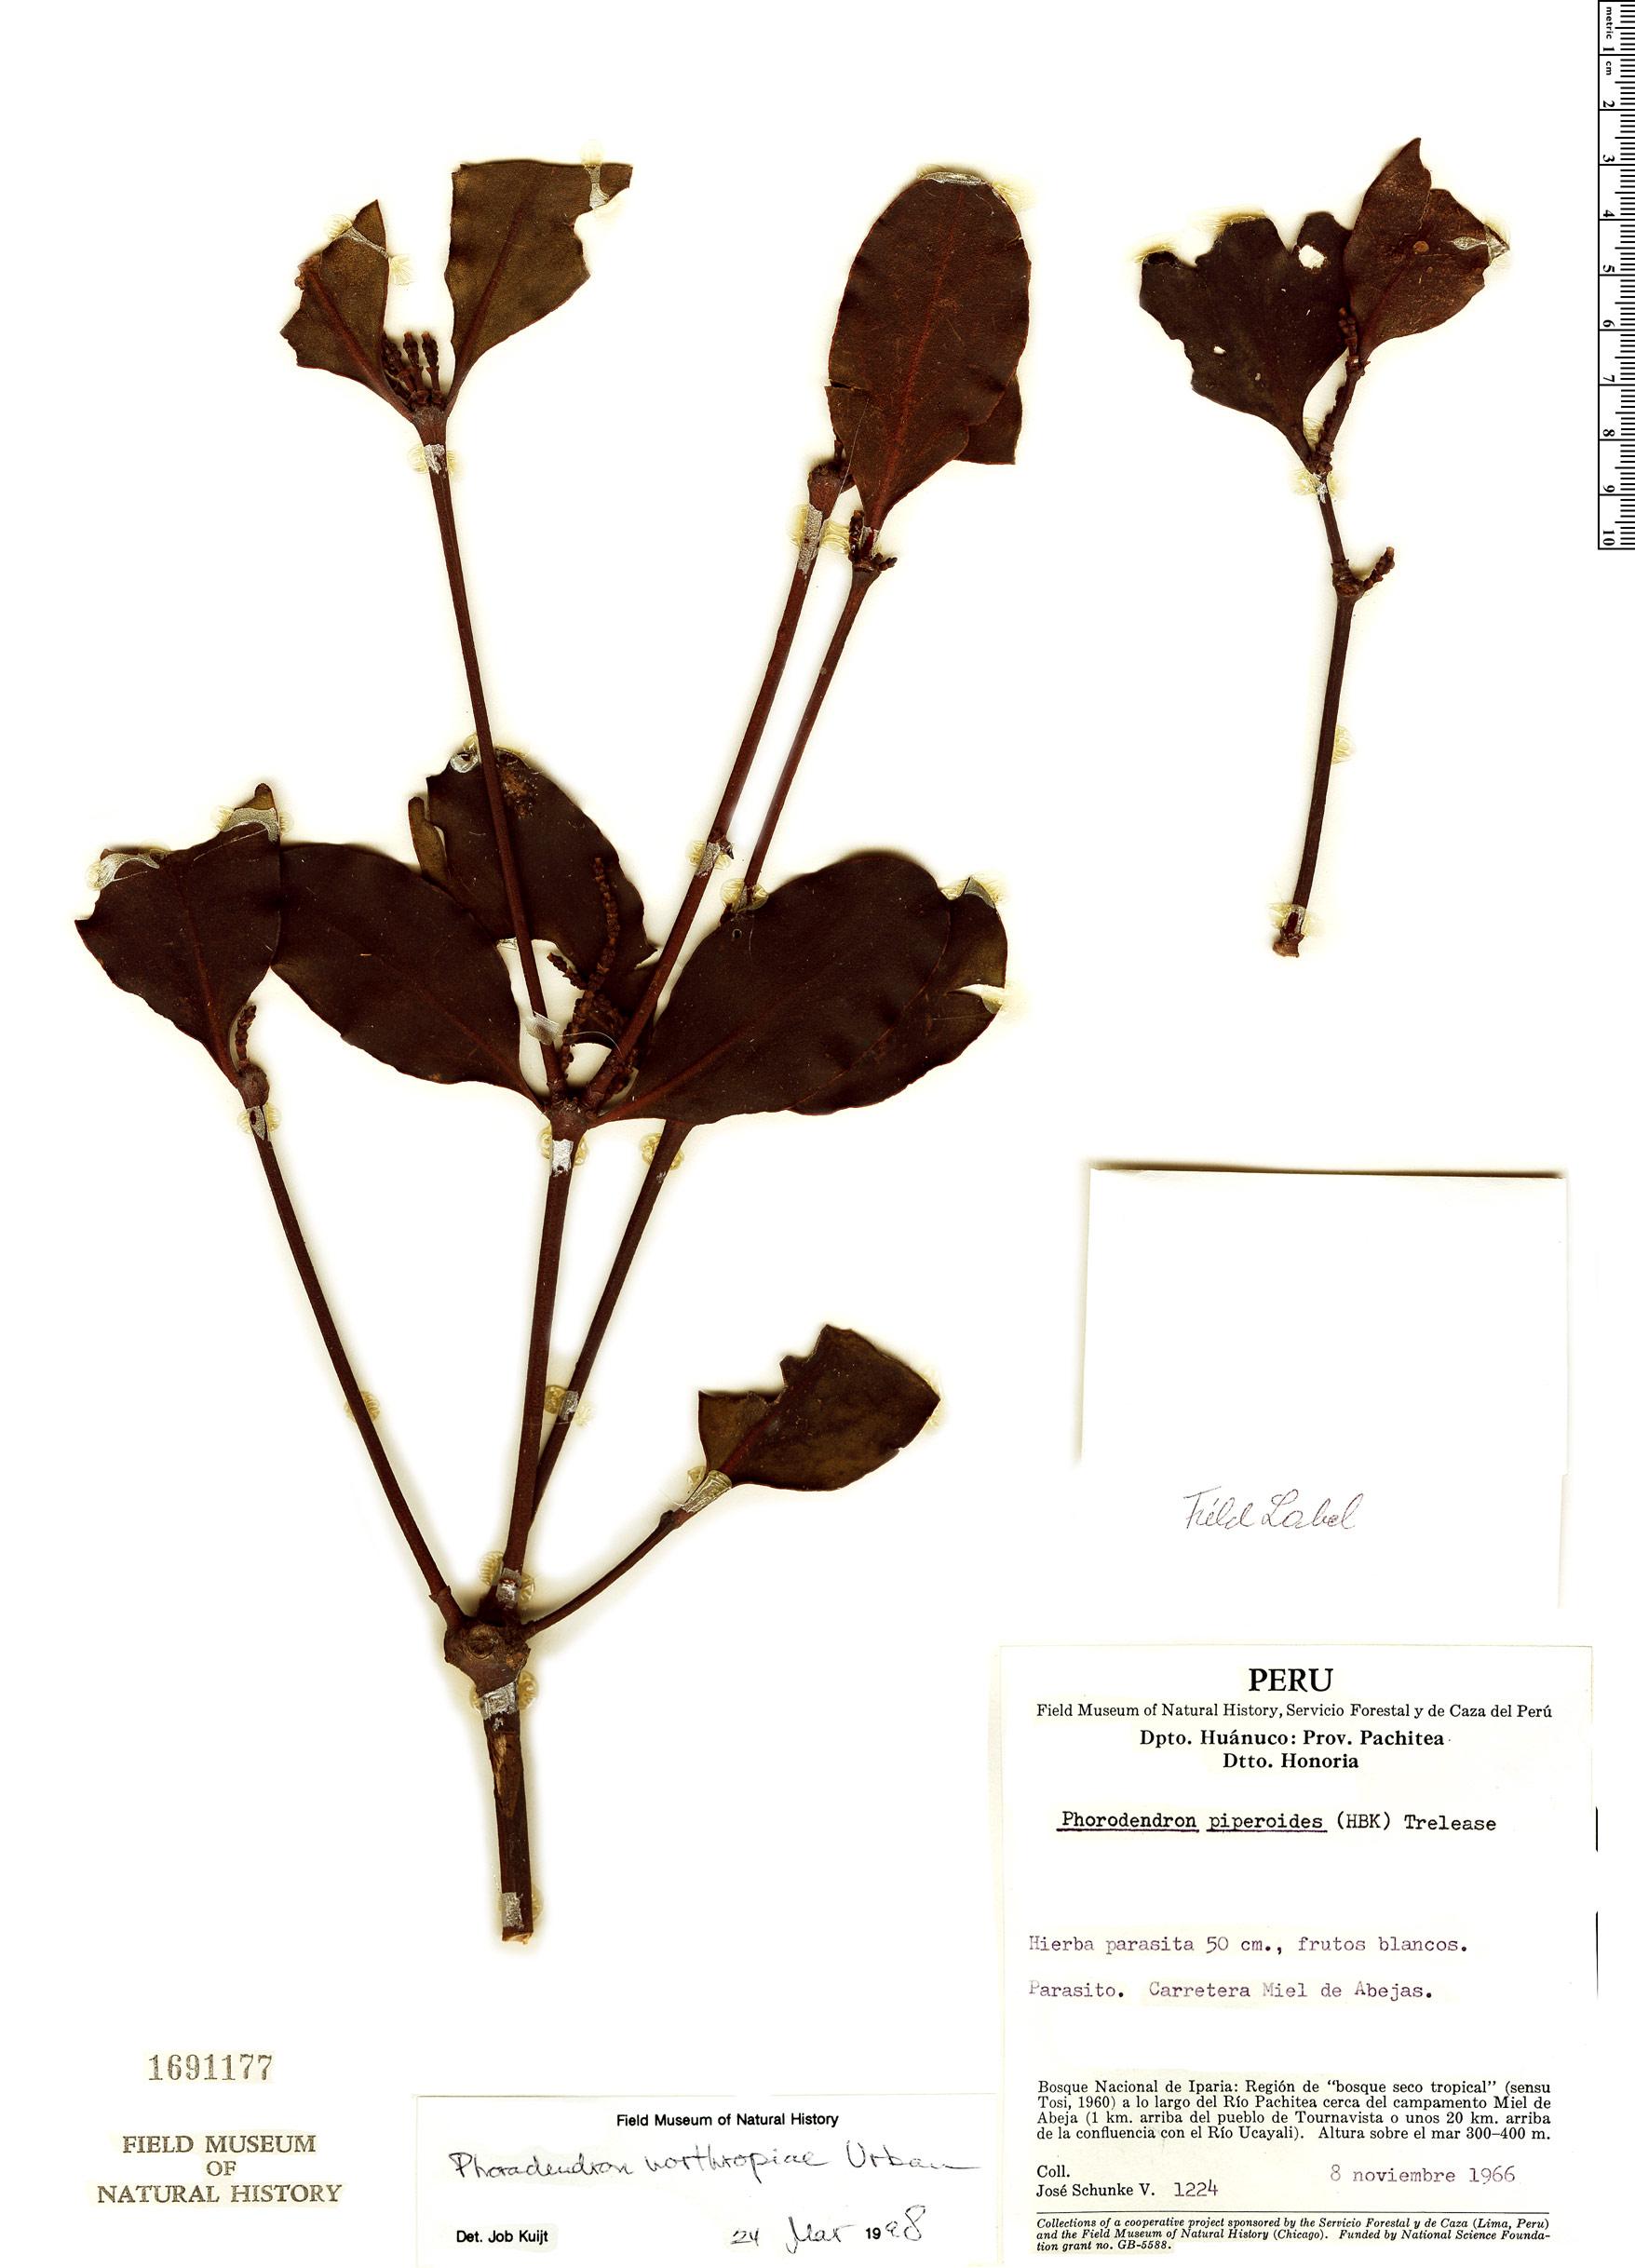 Espécime: Phoradendron northropiae